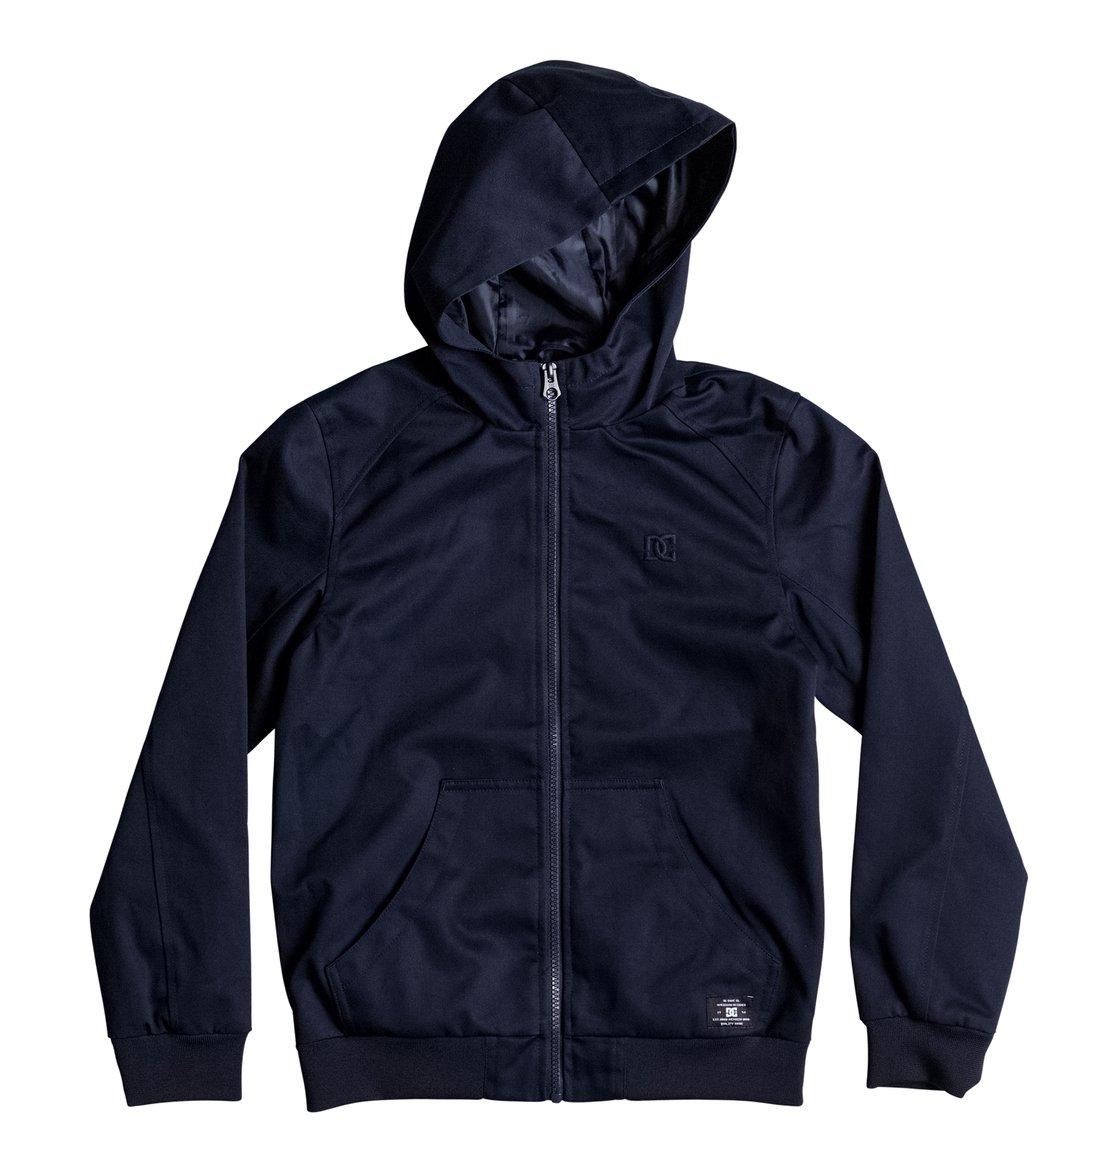 Водонепроницаемая куртка Ellis Light 2